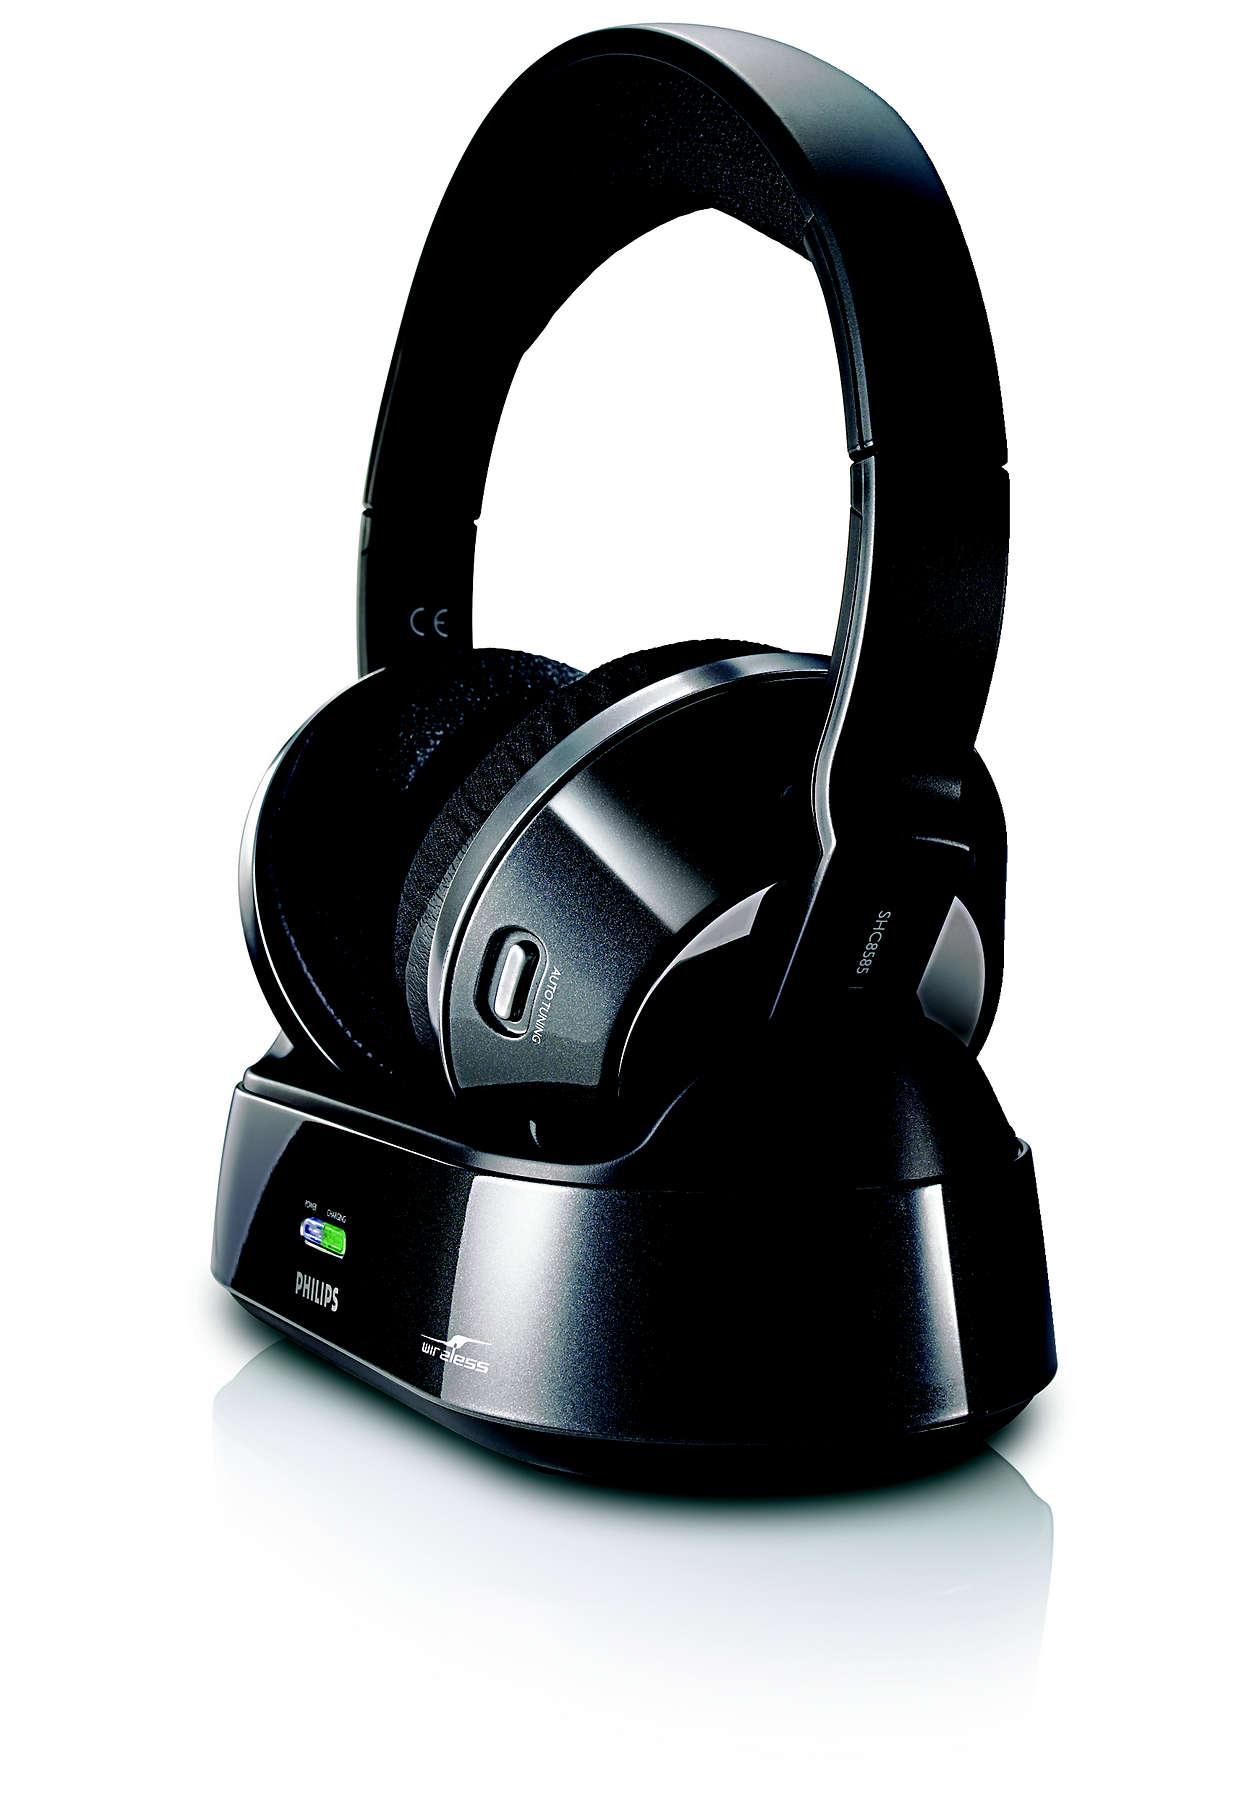 de4b24e35cf Wireless home cinema headphones SHC8585/00 | Philips